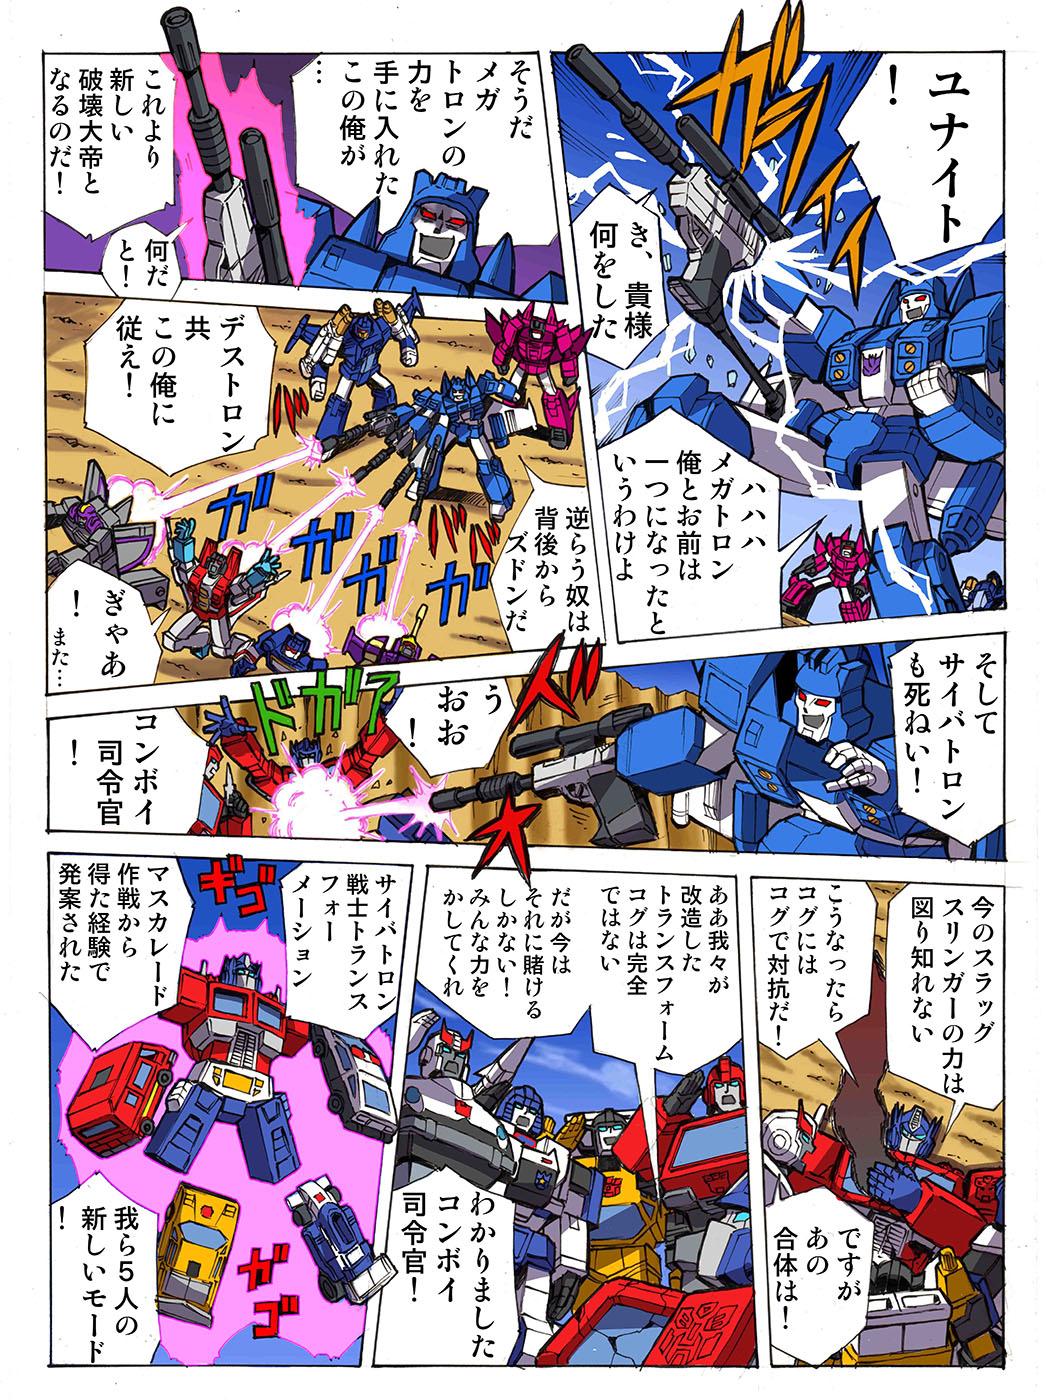 comic transformers legends web takara manga tf tfw2005 legedns seibertron ep thread boards lg energon pub forums